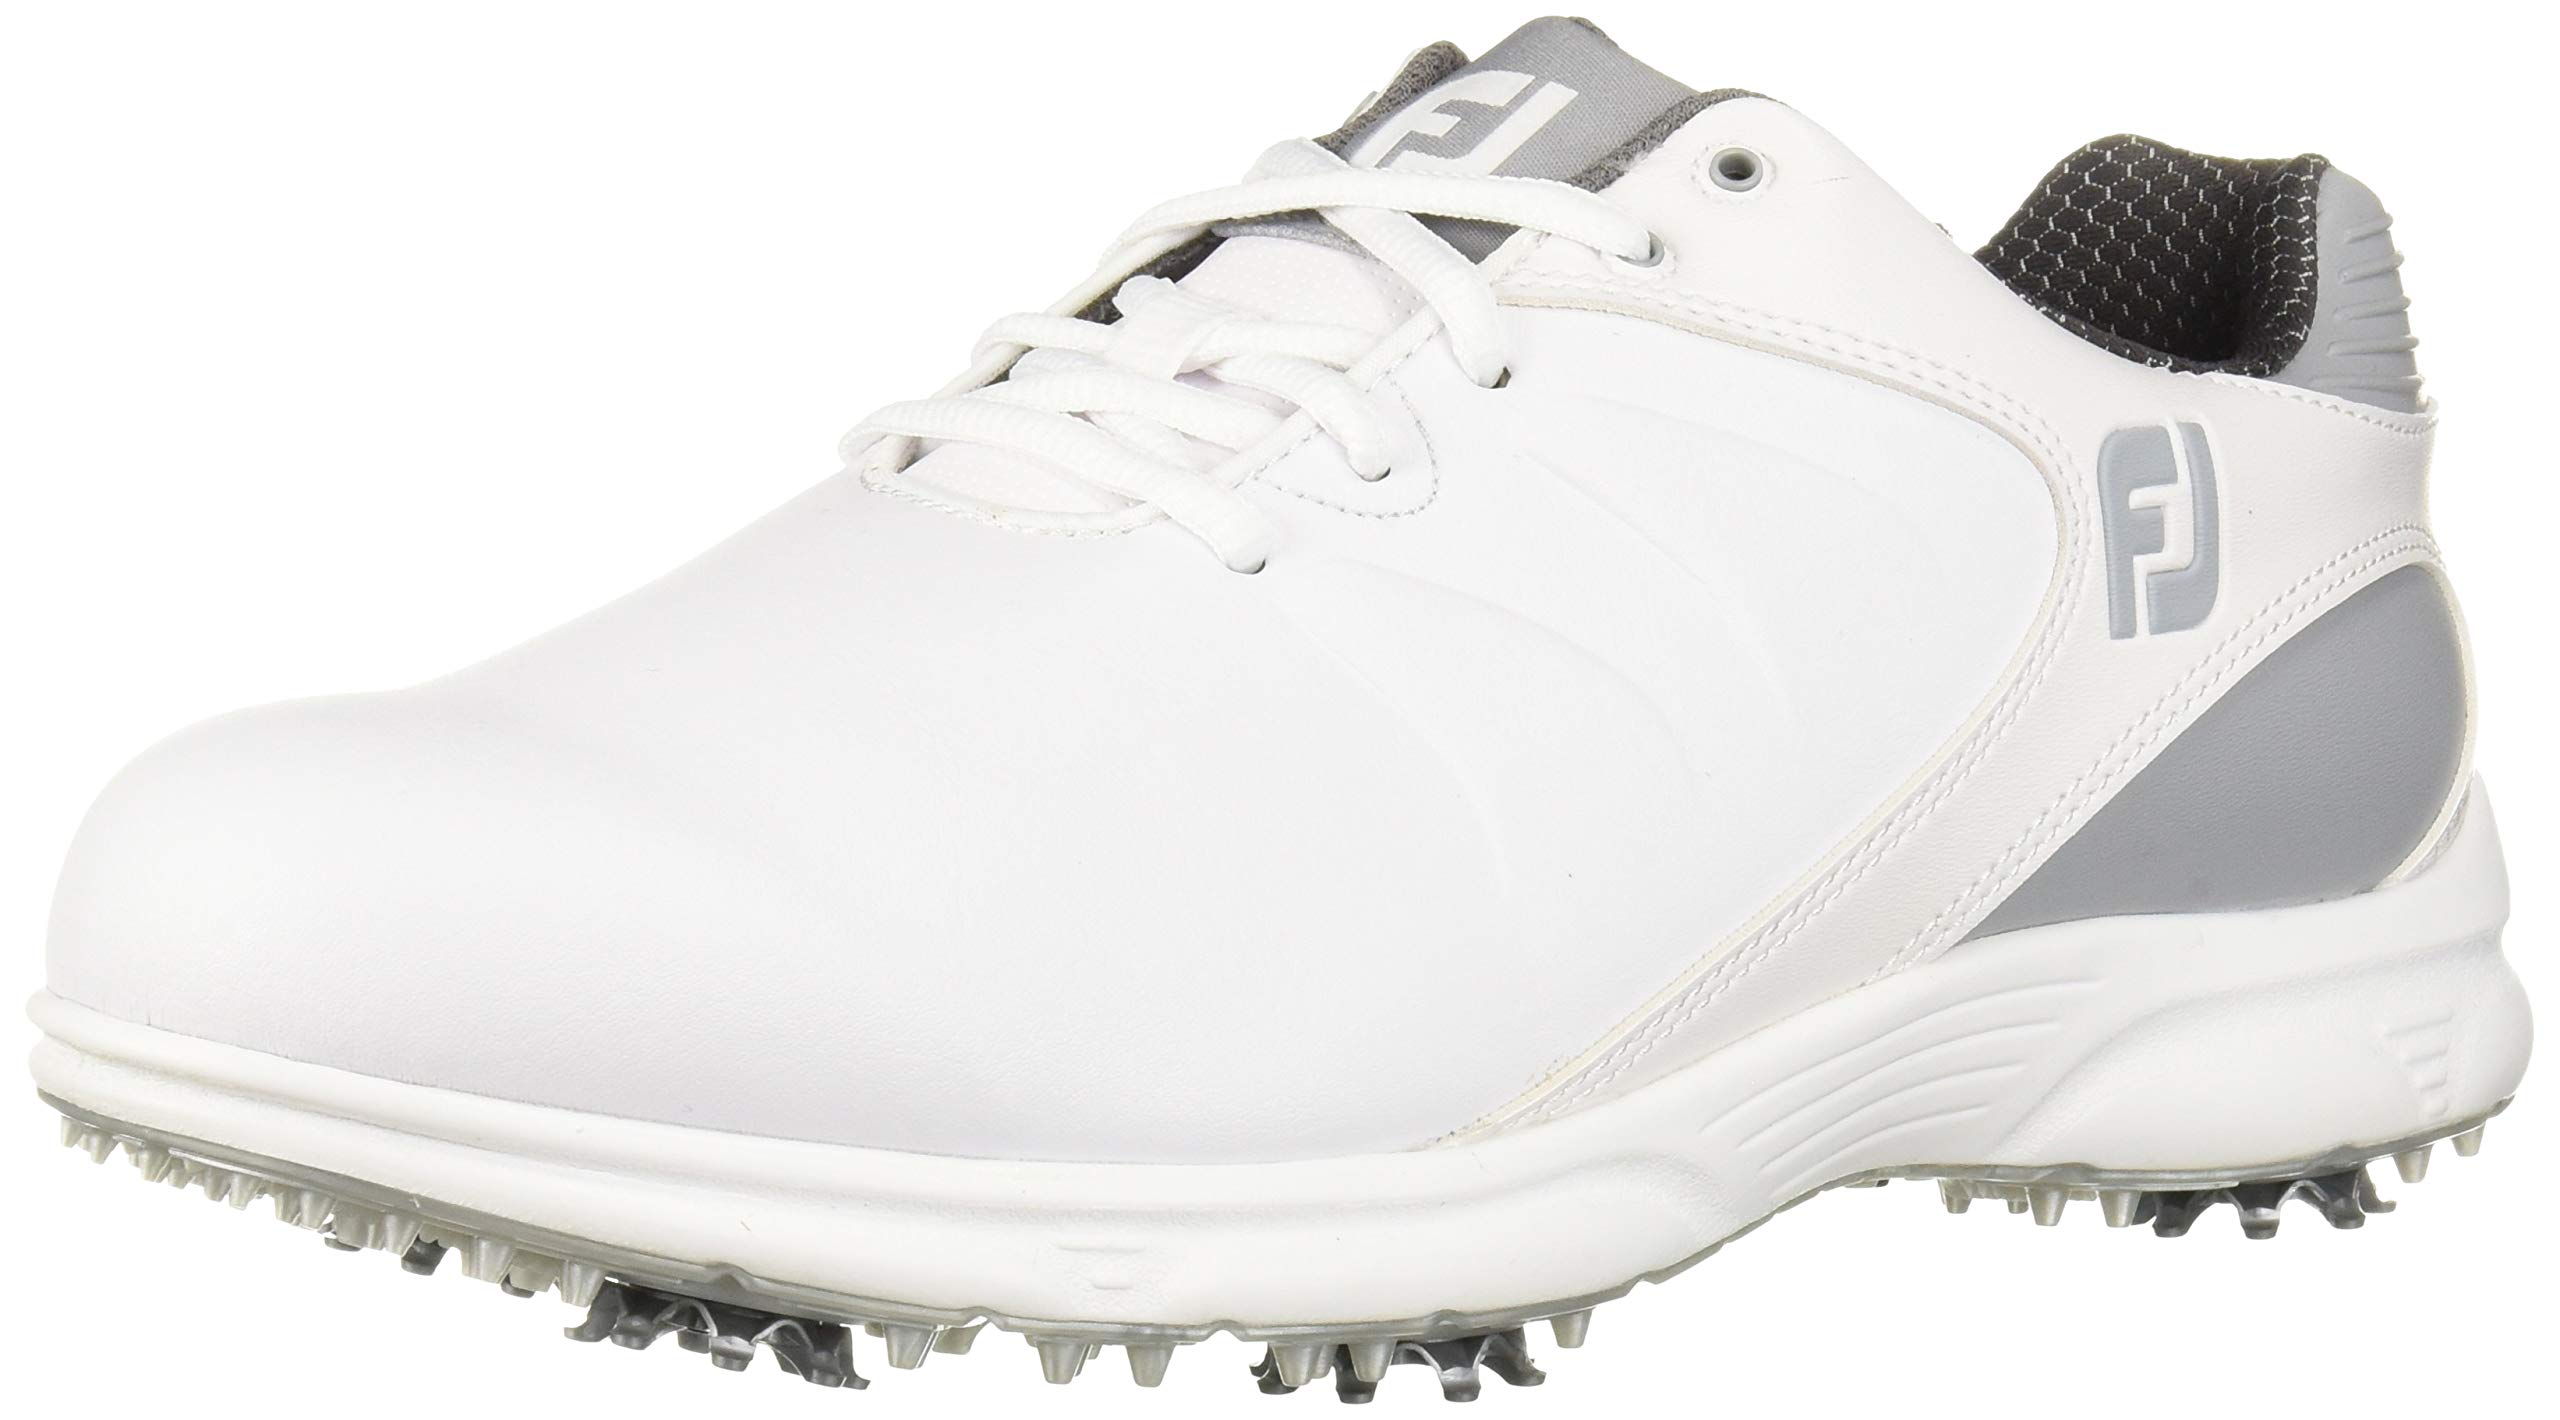 FootJoy Men's ARC XT Golf Shoes, White, 9.5 M by FootJoy